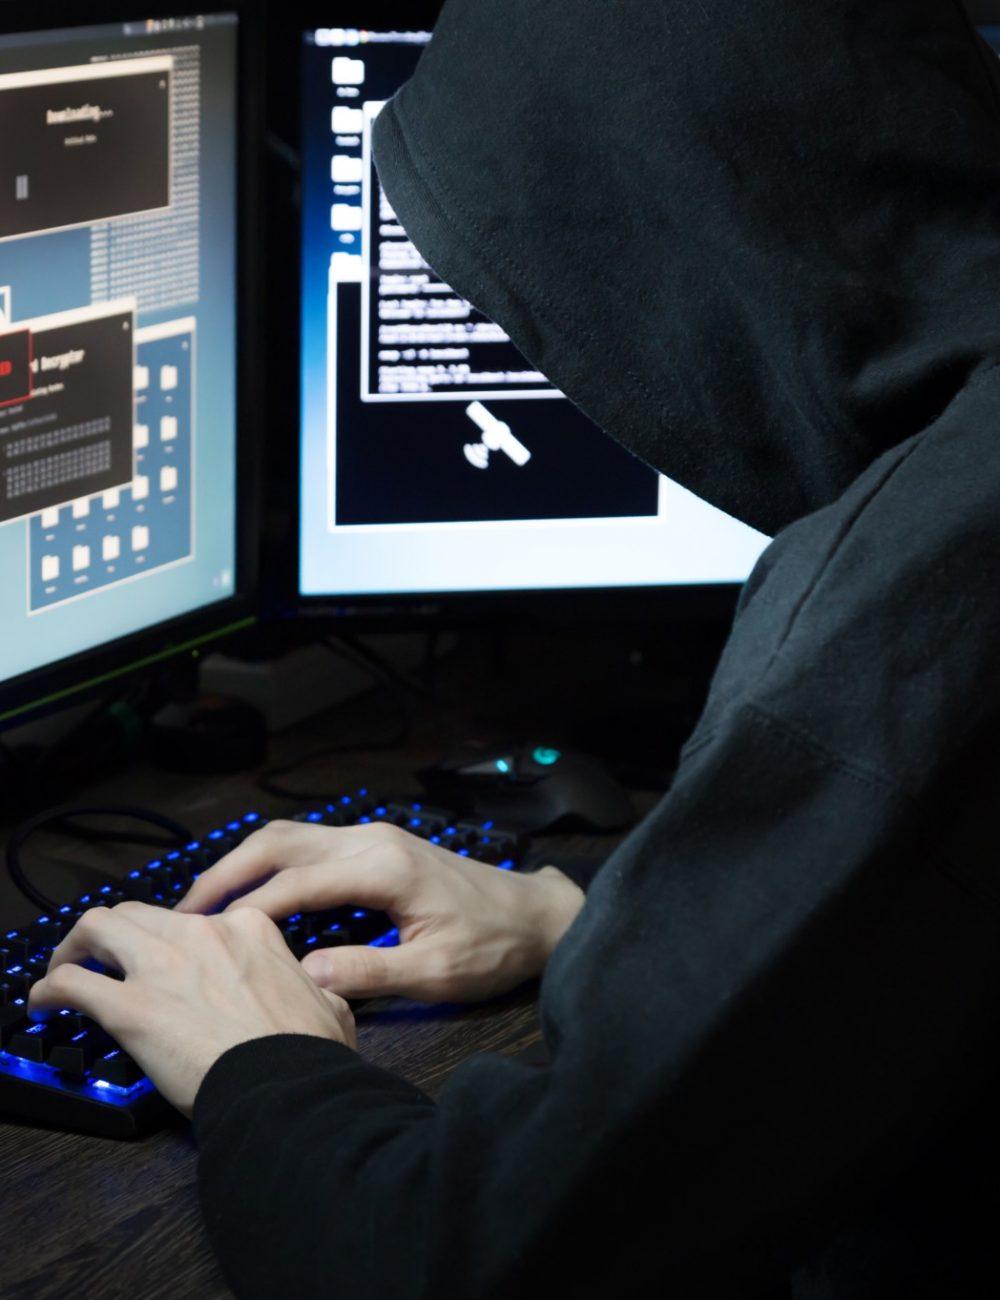 cyber-security-hack-business-financial-man-person-unrecognizable-criminal-thief-pc-electronics-screen_t20_zLxj8n